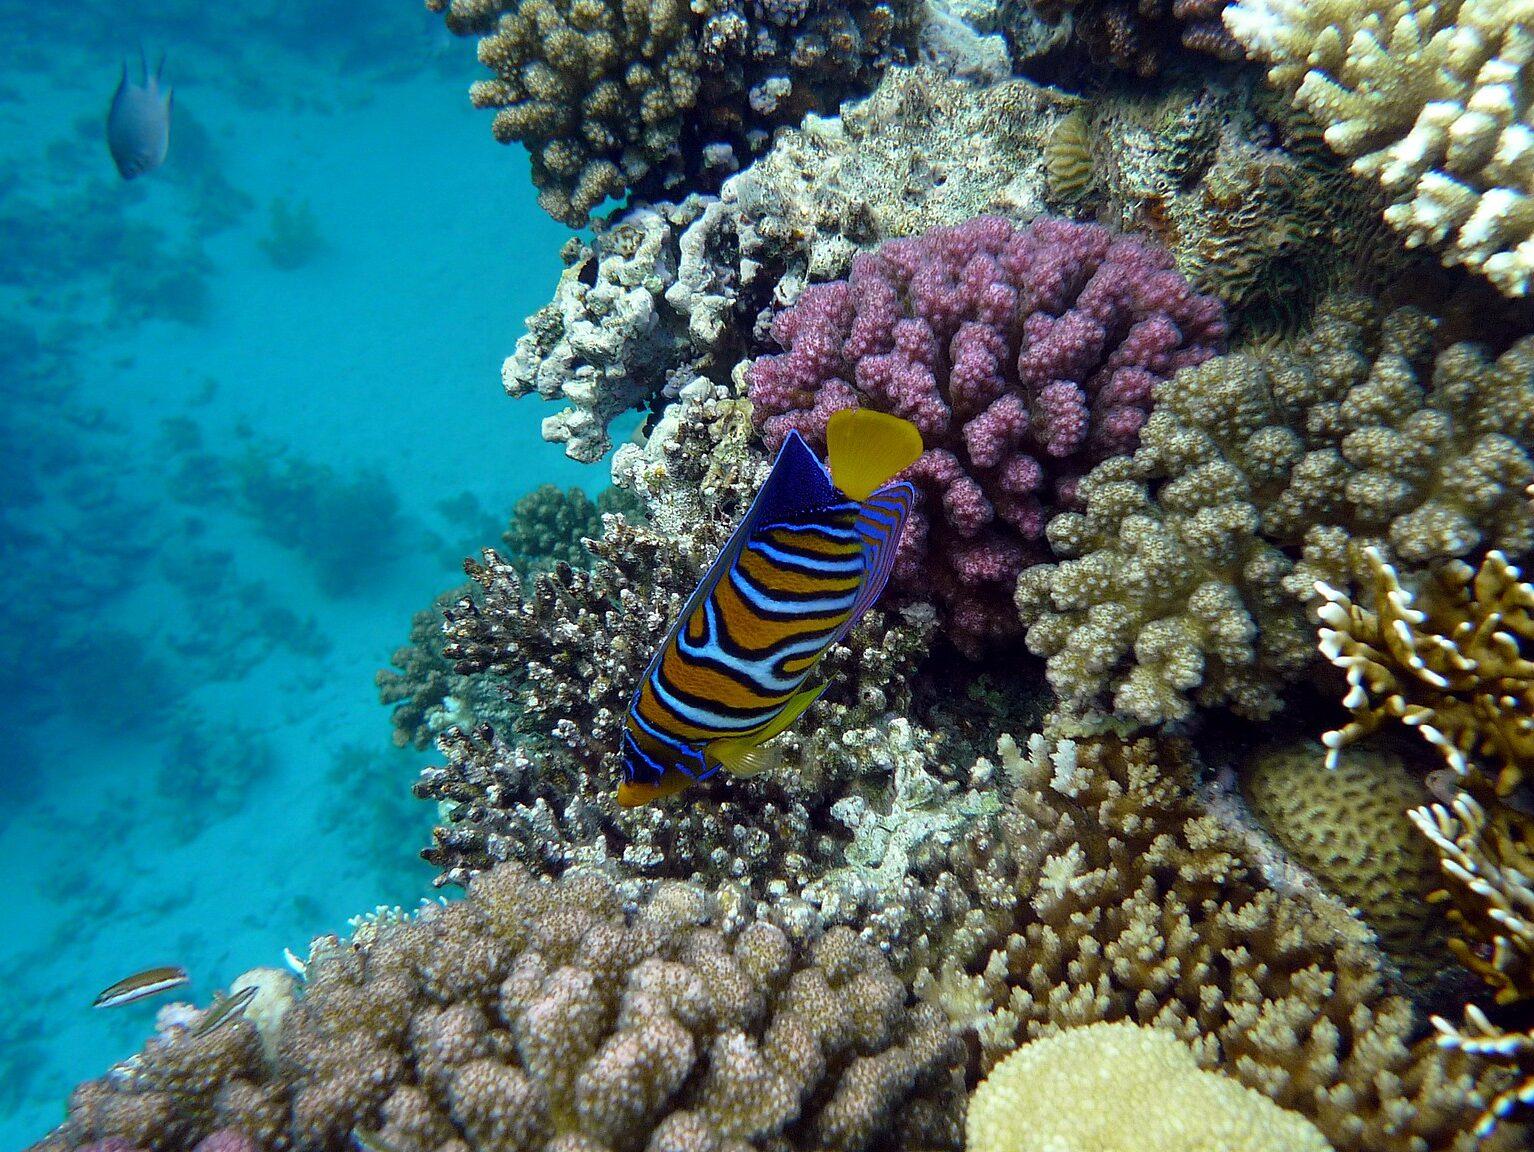 Cosa vedere a Sharm El Sheikh: La barriera corallina